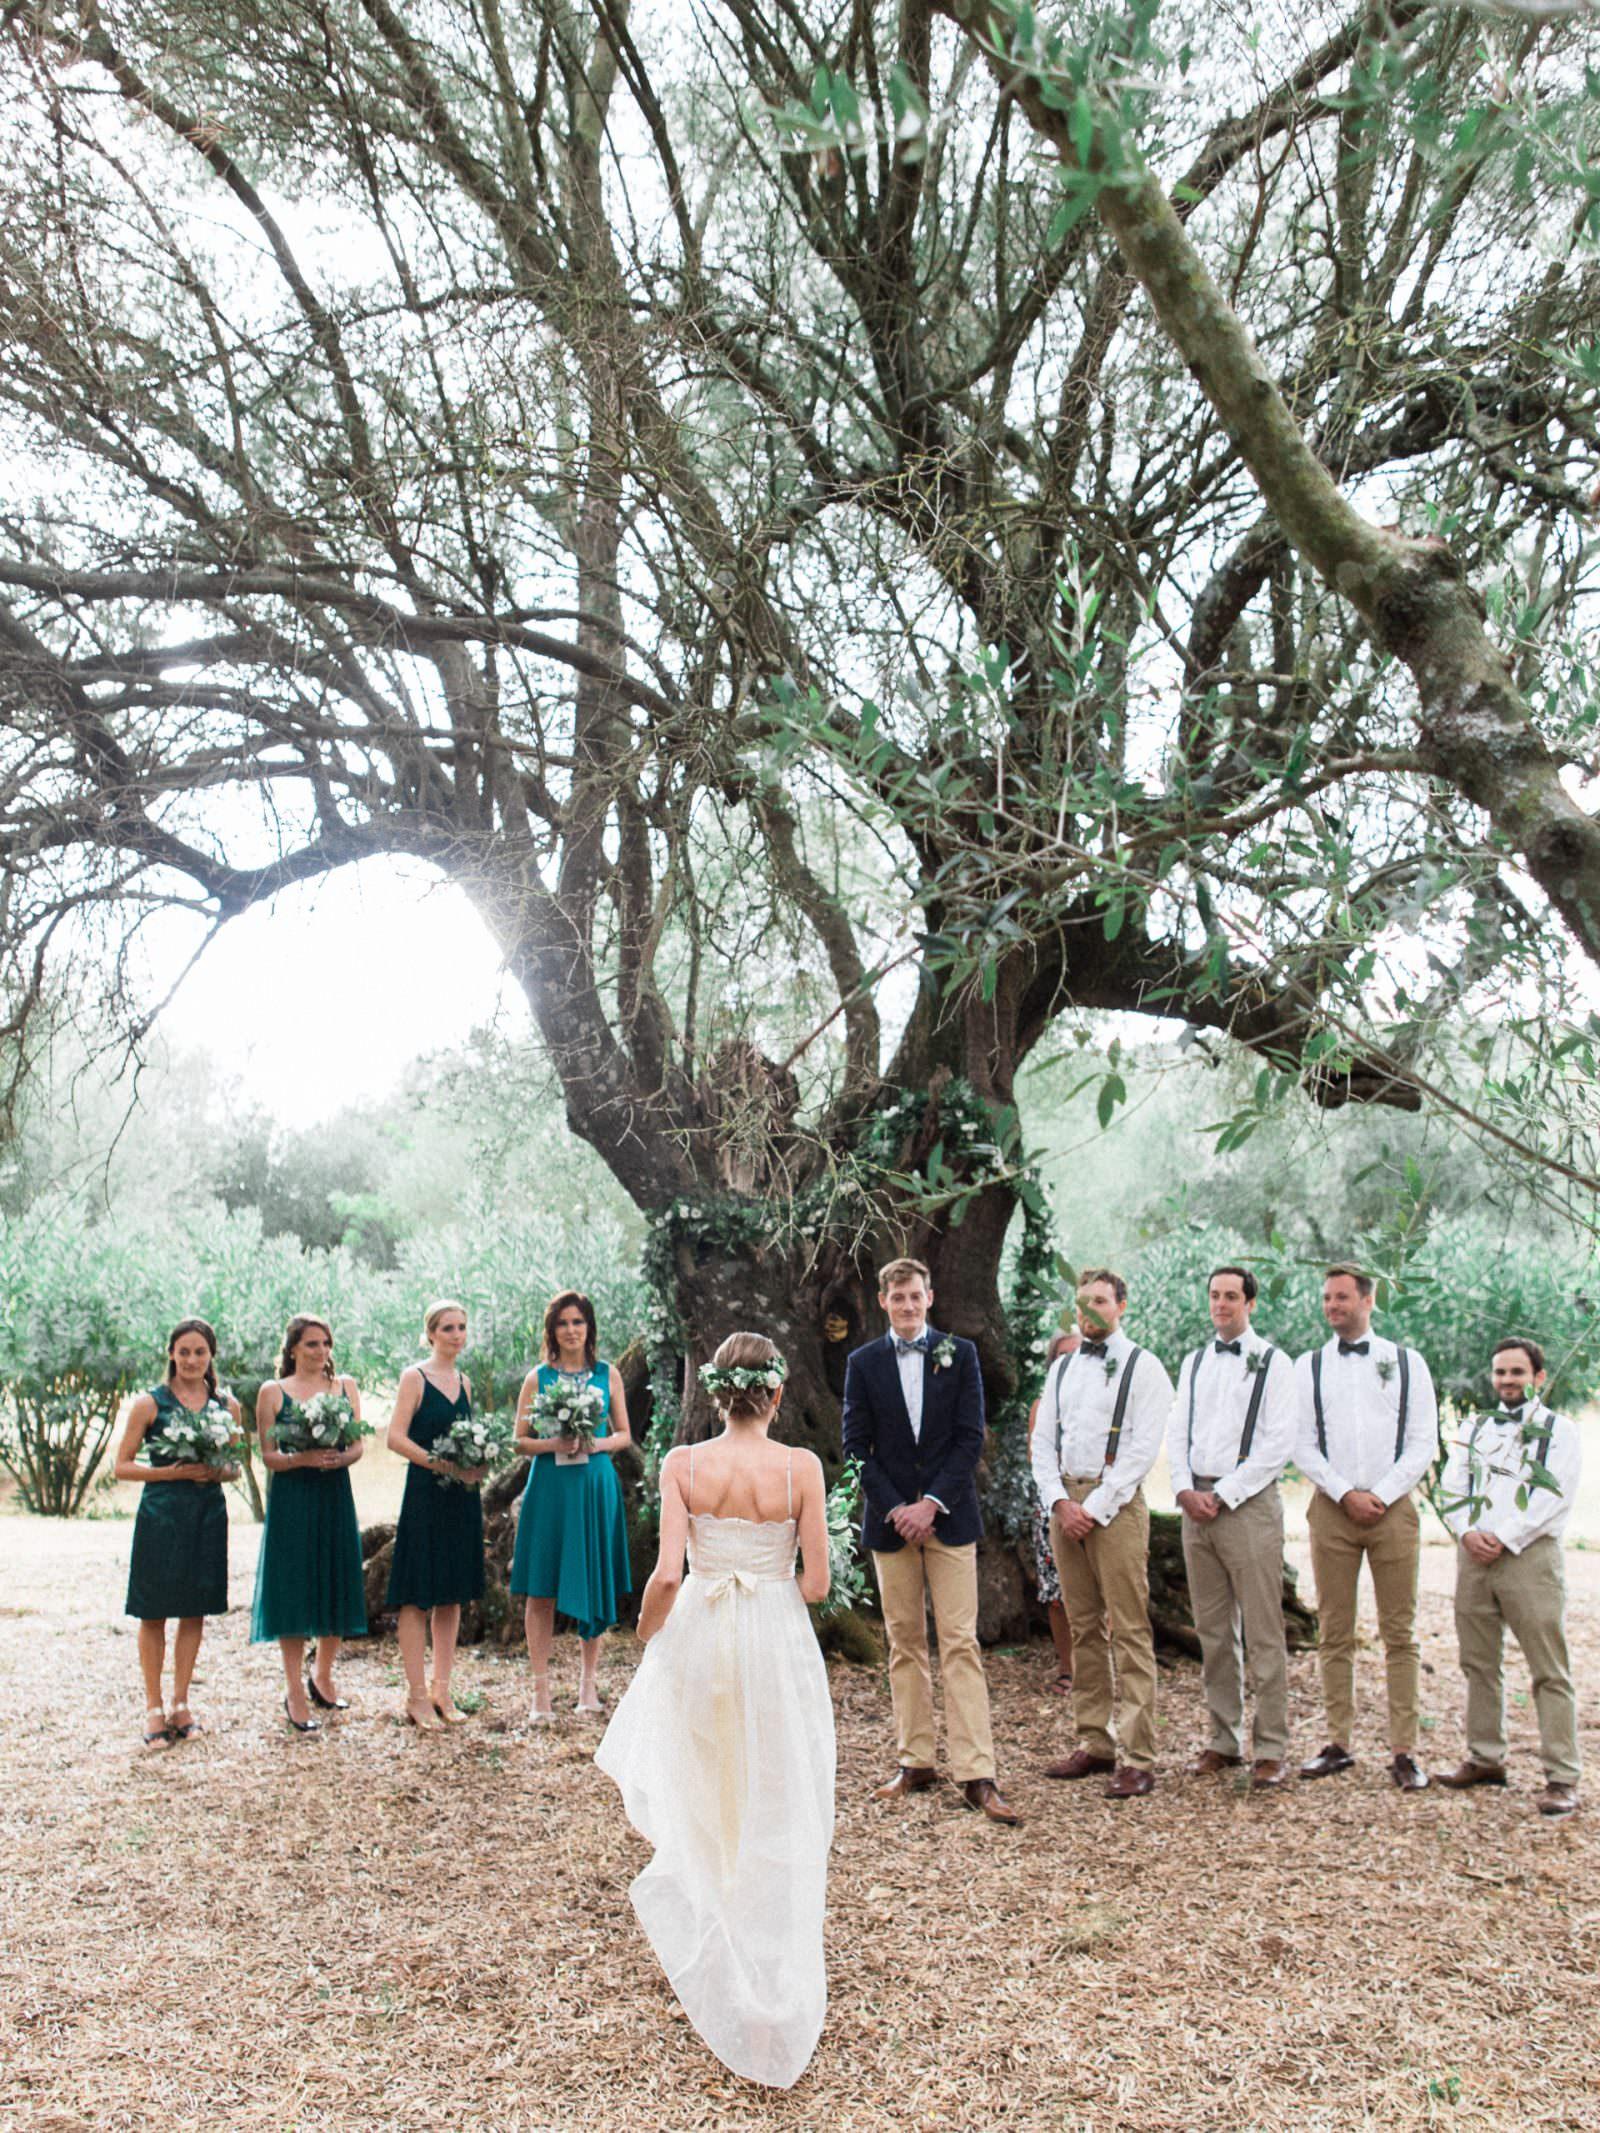 Olive Garden wedding ceremony at Gentilini Retreat